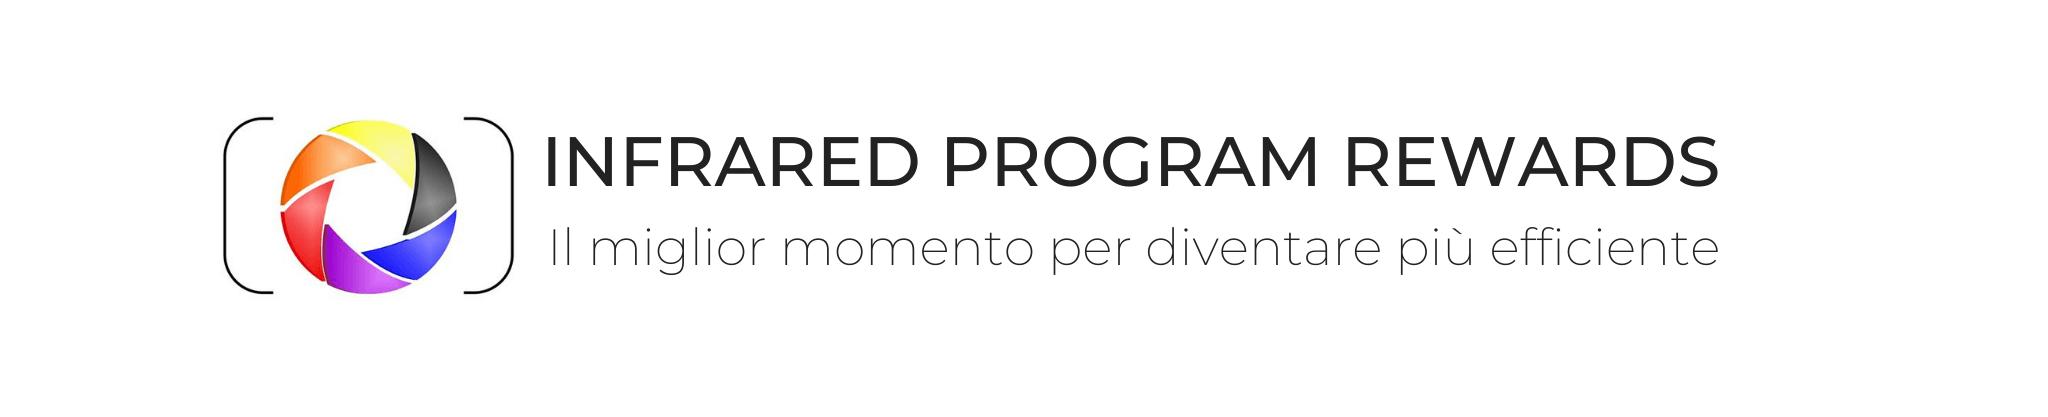 Logo infrared program rewards